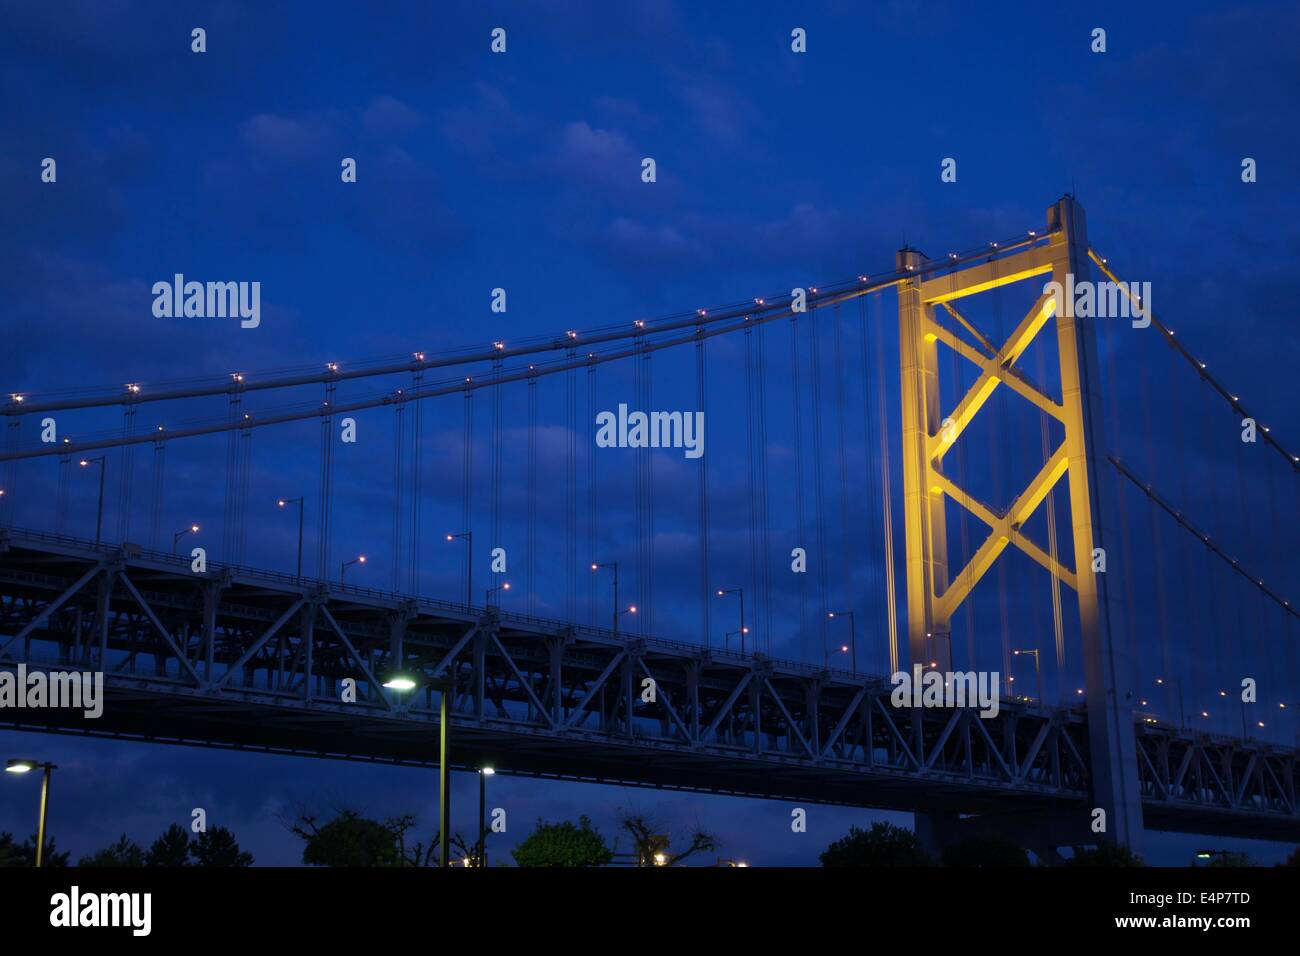 Great Seto Bridge (Seto Ohashi) at Dusk in Kagawa Prefecture, Japan Stock Photo